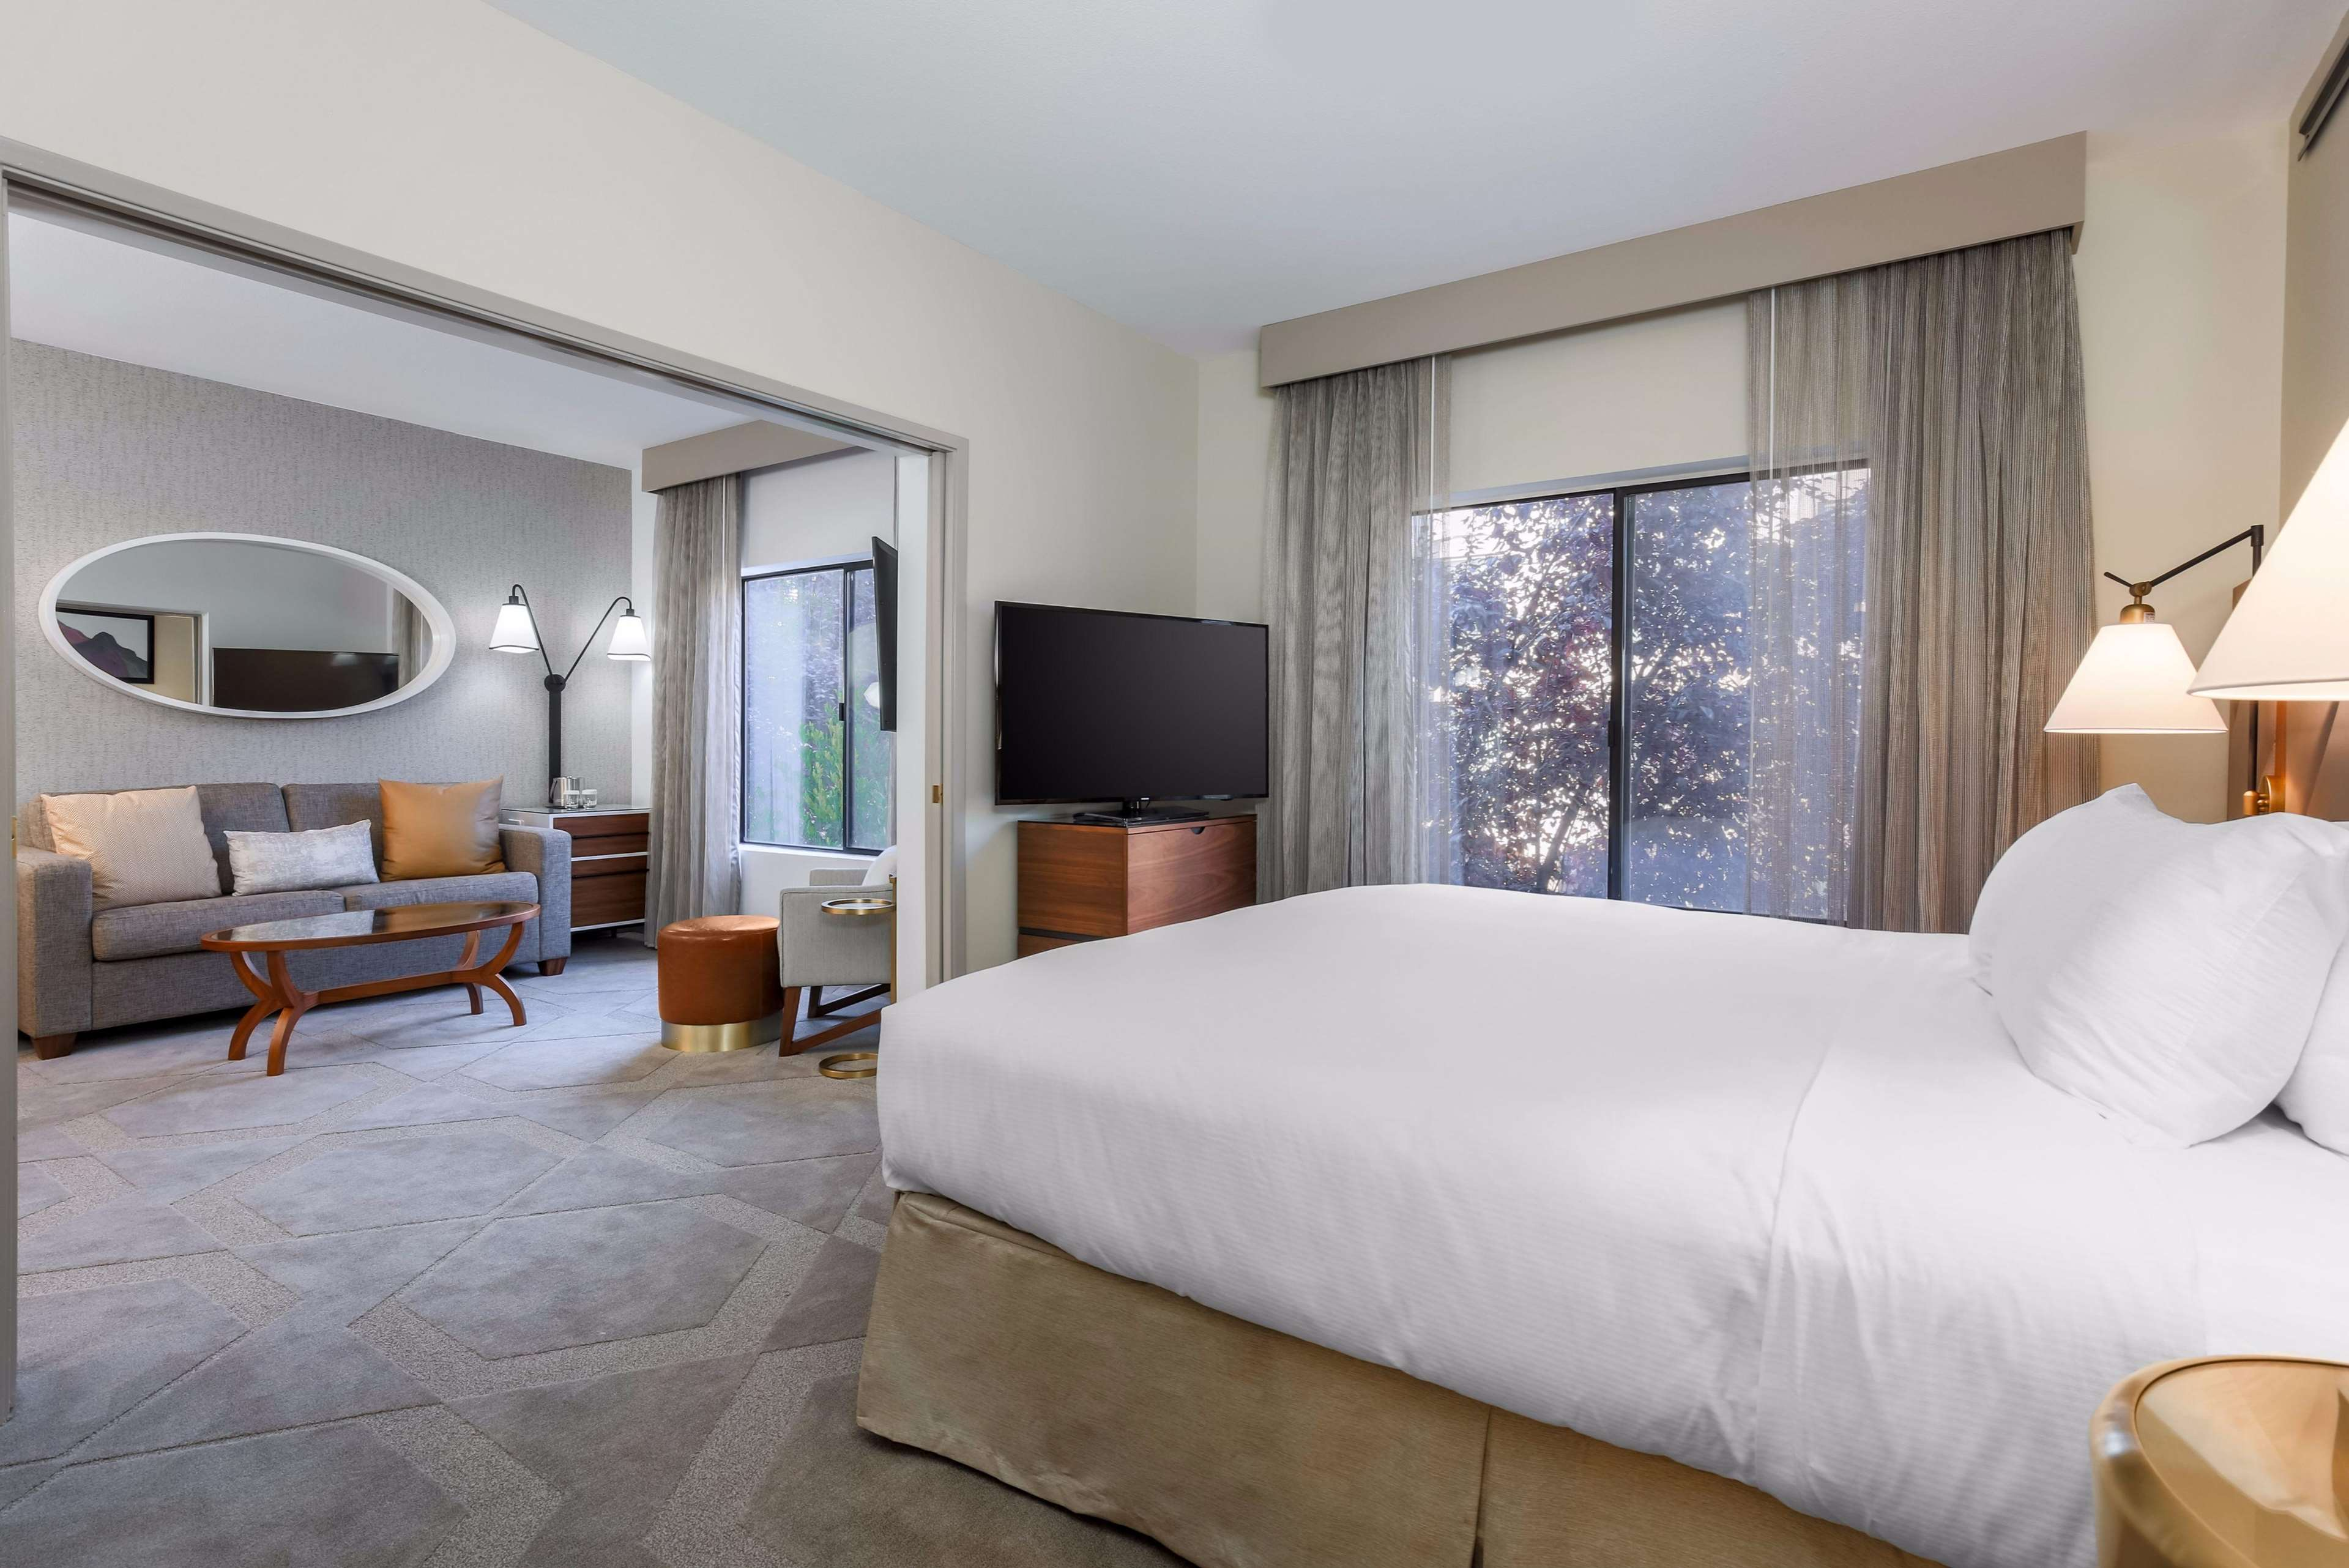 Doubletree Suites By Hilton Hotel Sacramento Rancho